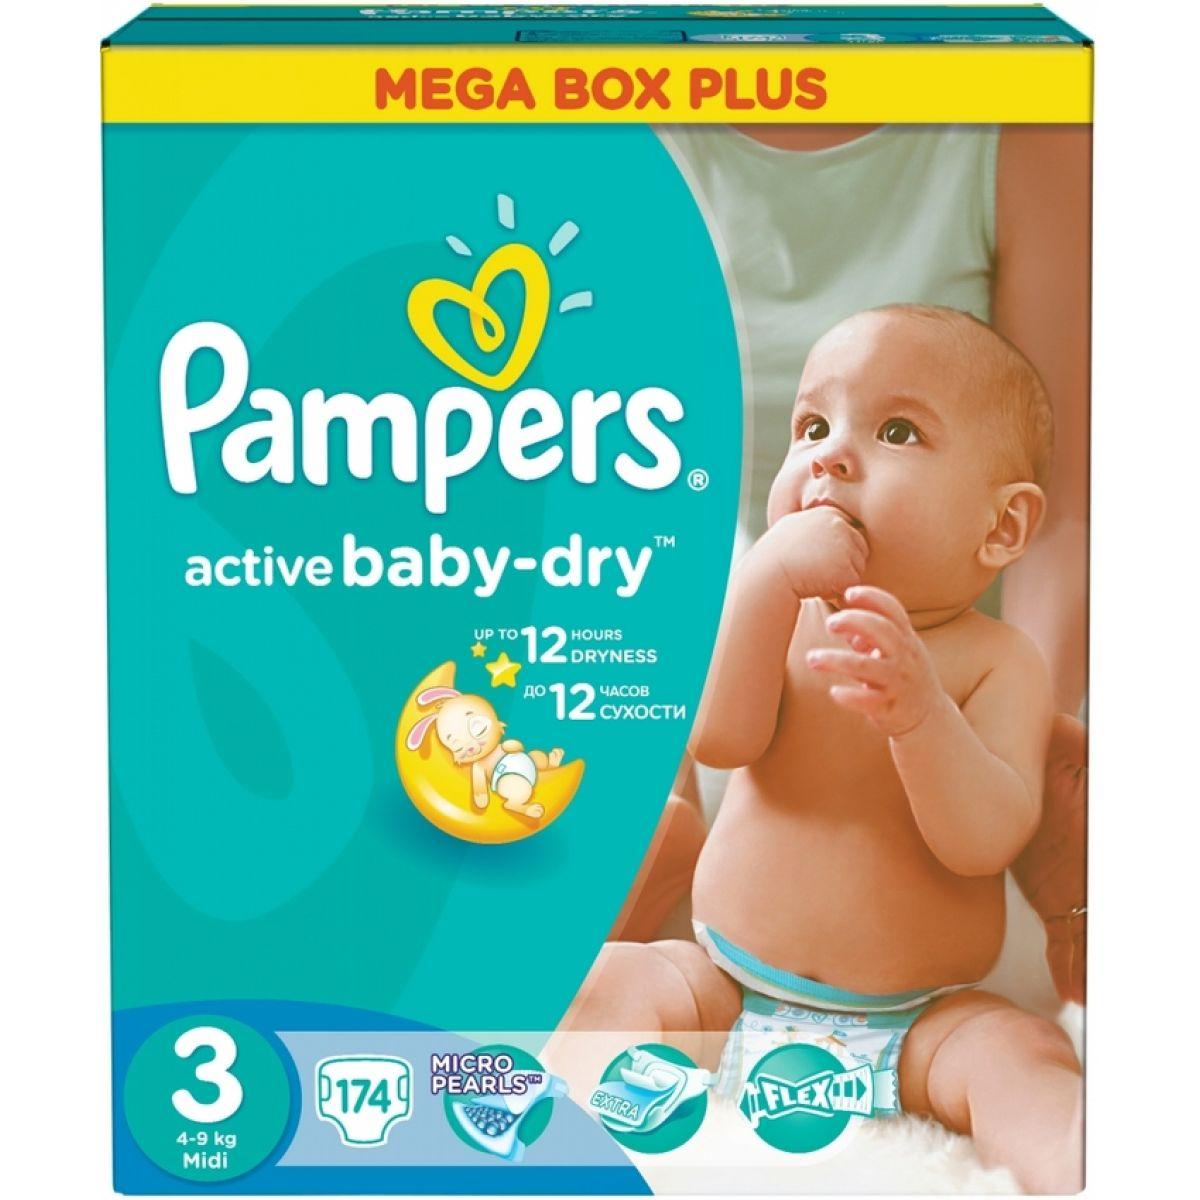 Active Baby Pampers Dry 3 plienky Mega Box Plus 174ks